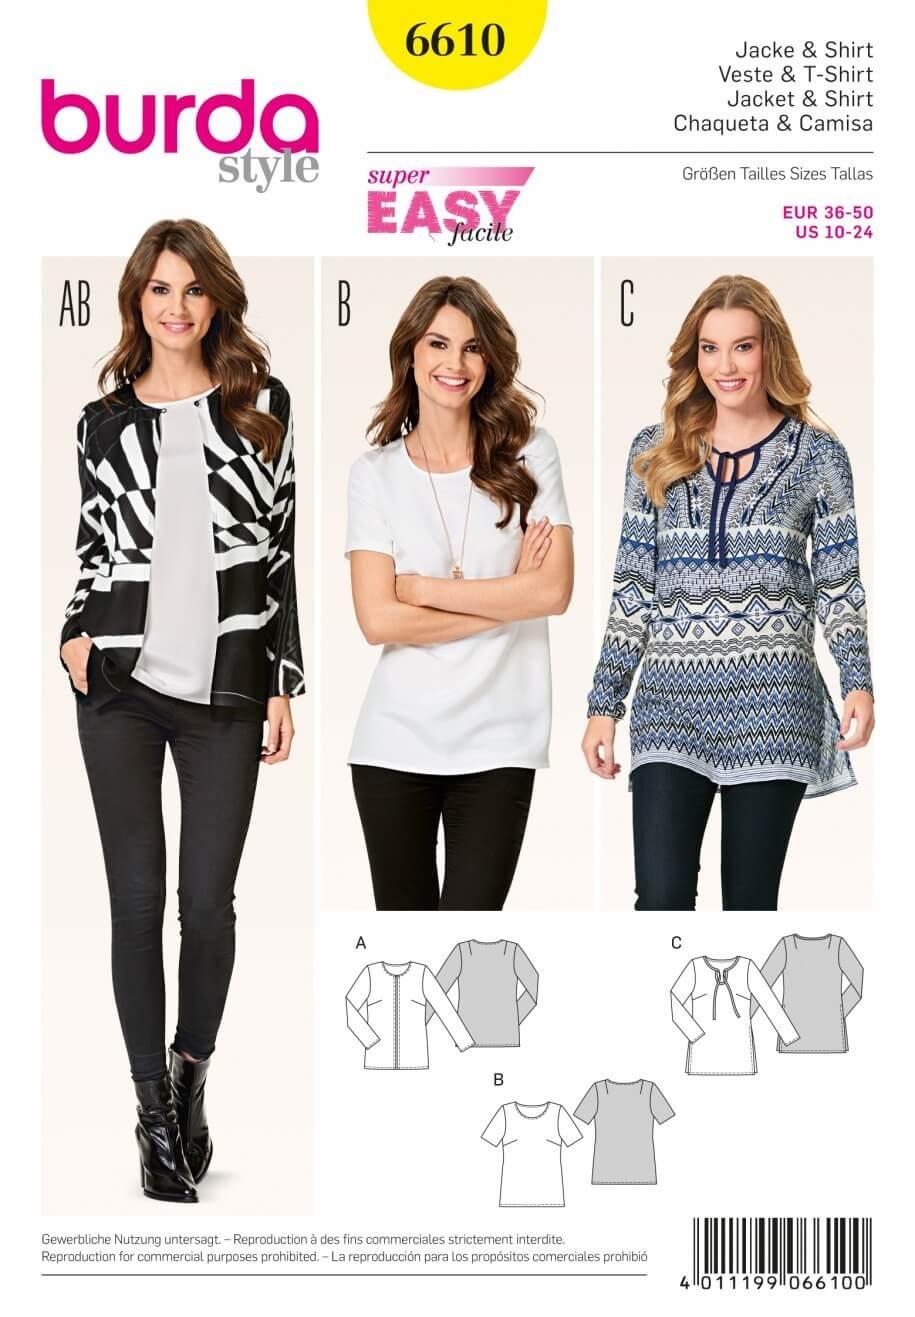 Burda Style Jacket & Shirt Top Blouse Dress Sewing Pattern 6610